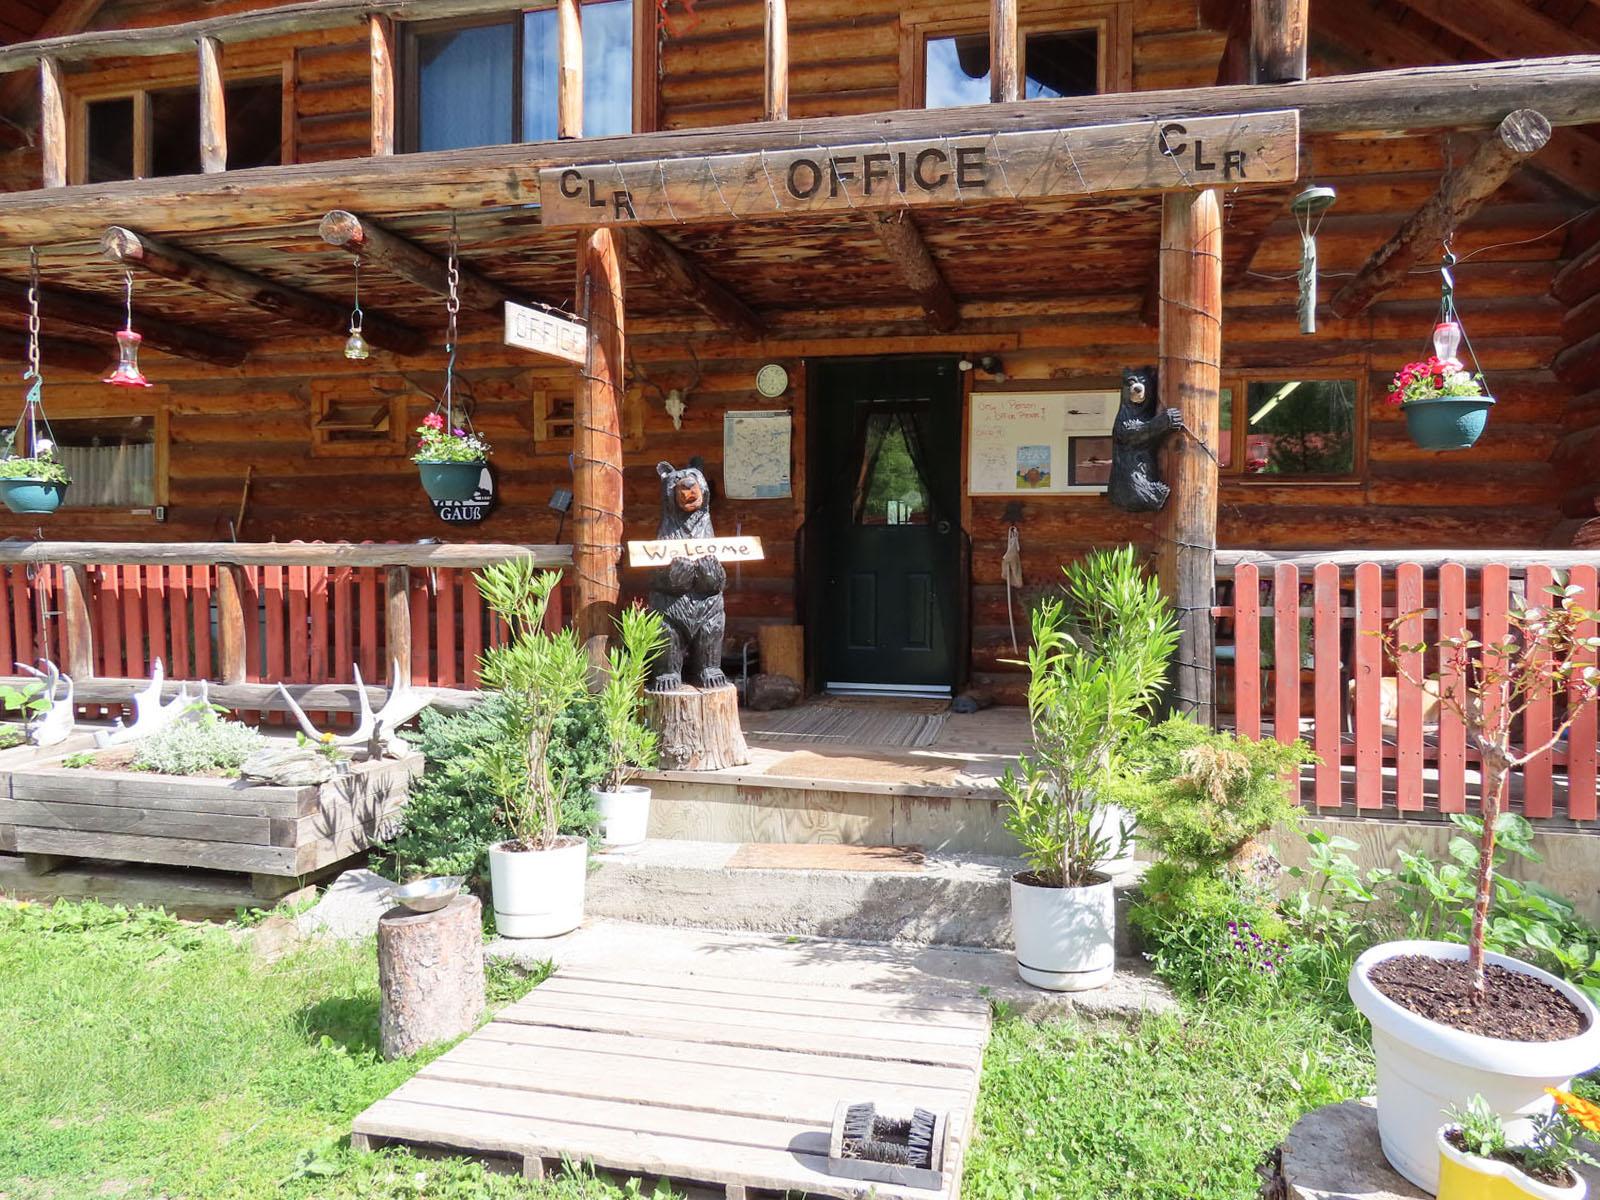 Canim lake resort 30